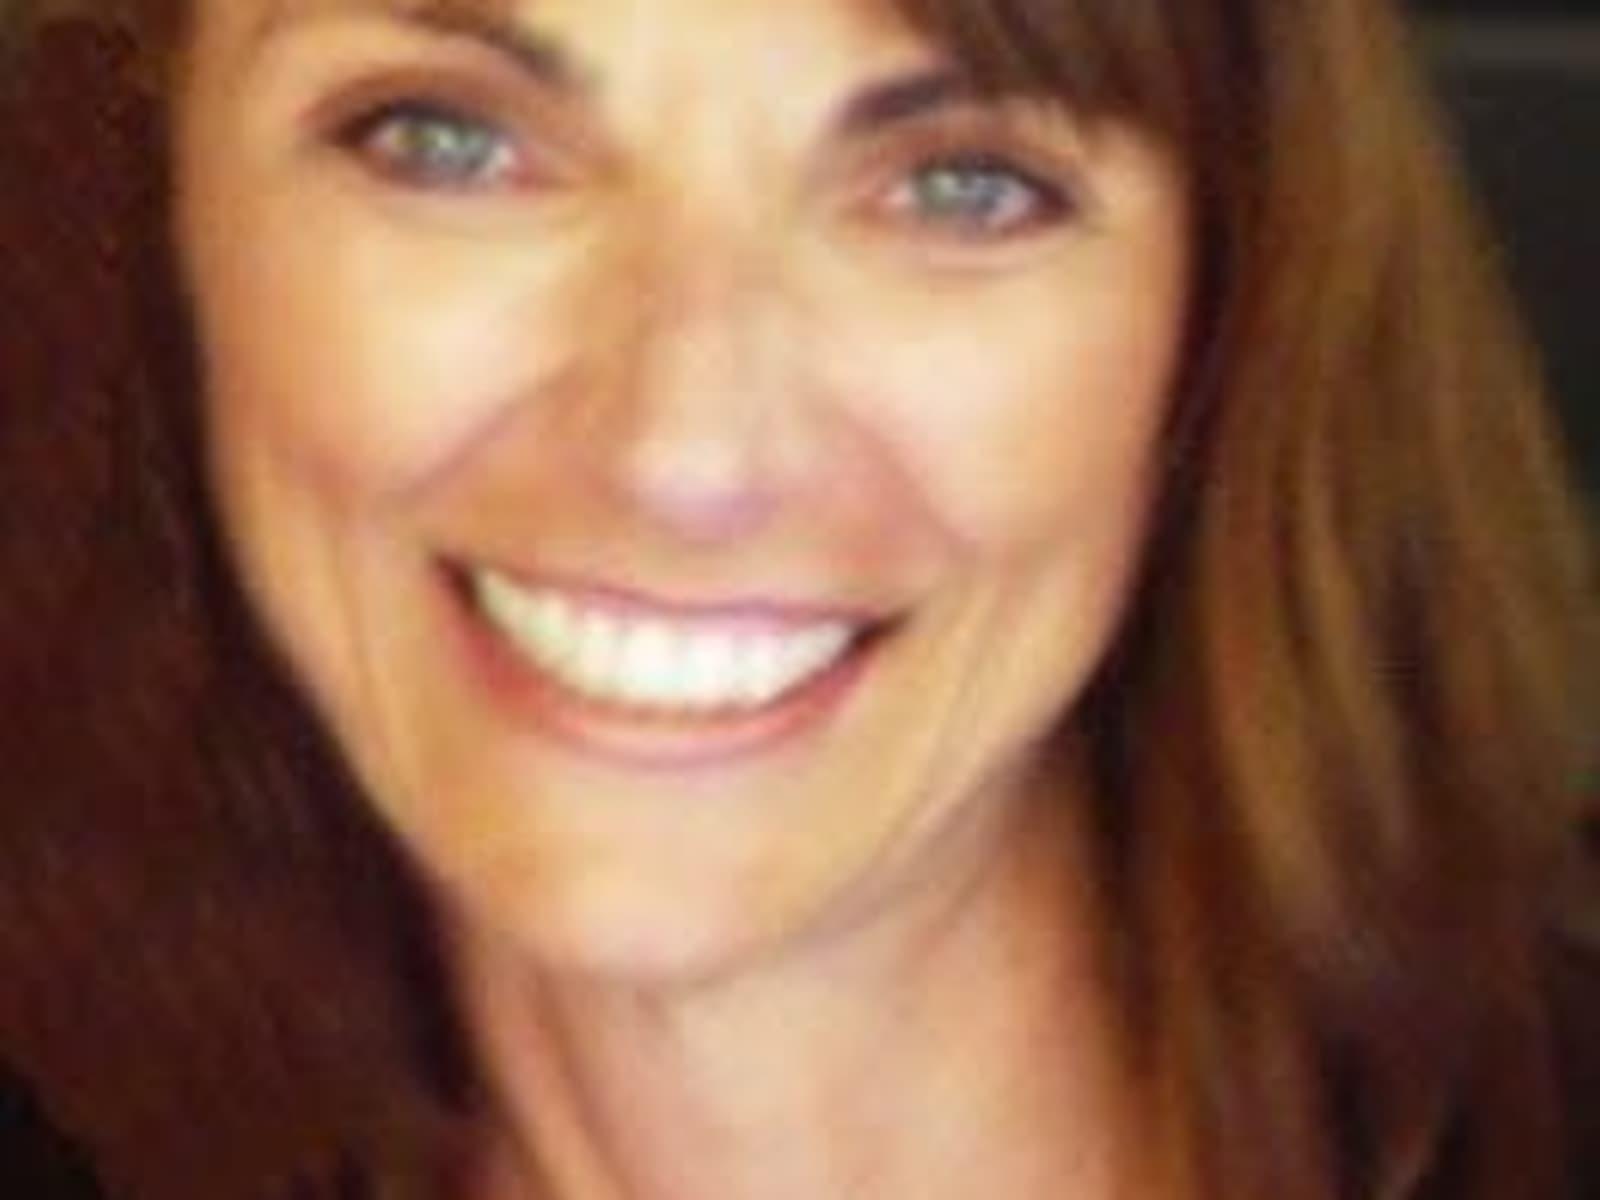 Regina from Greenville, South Carolina, United States